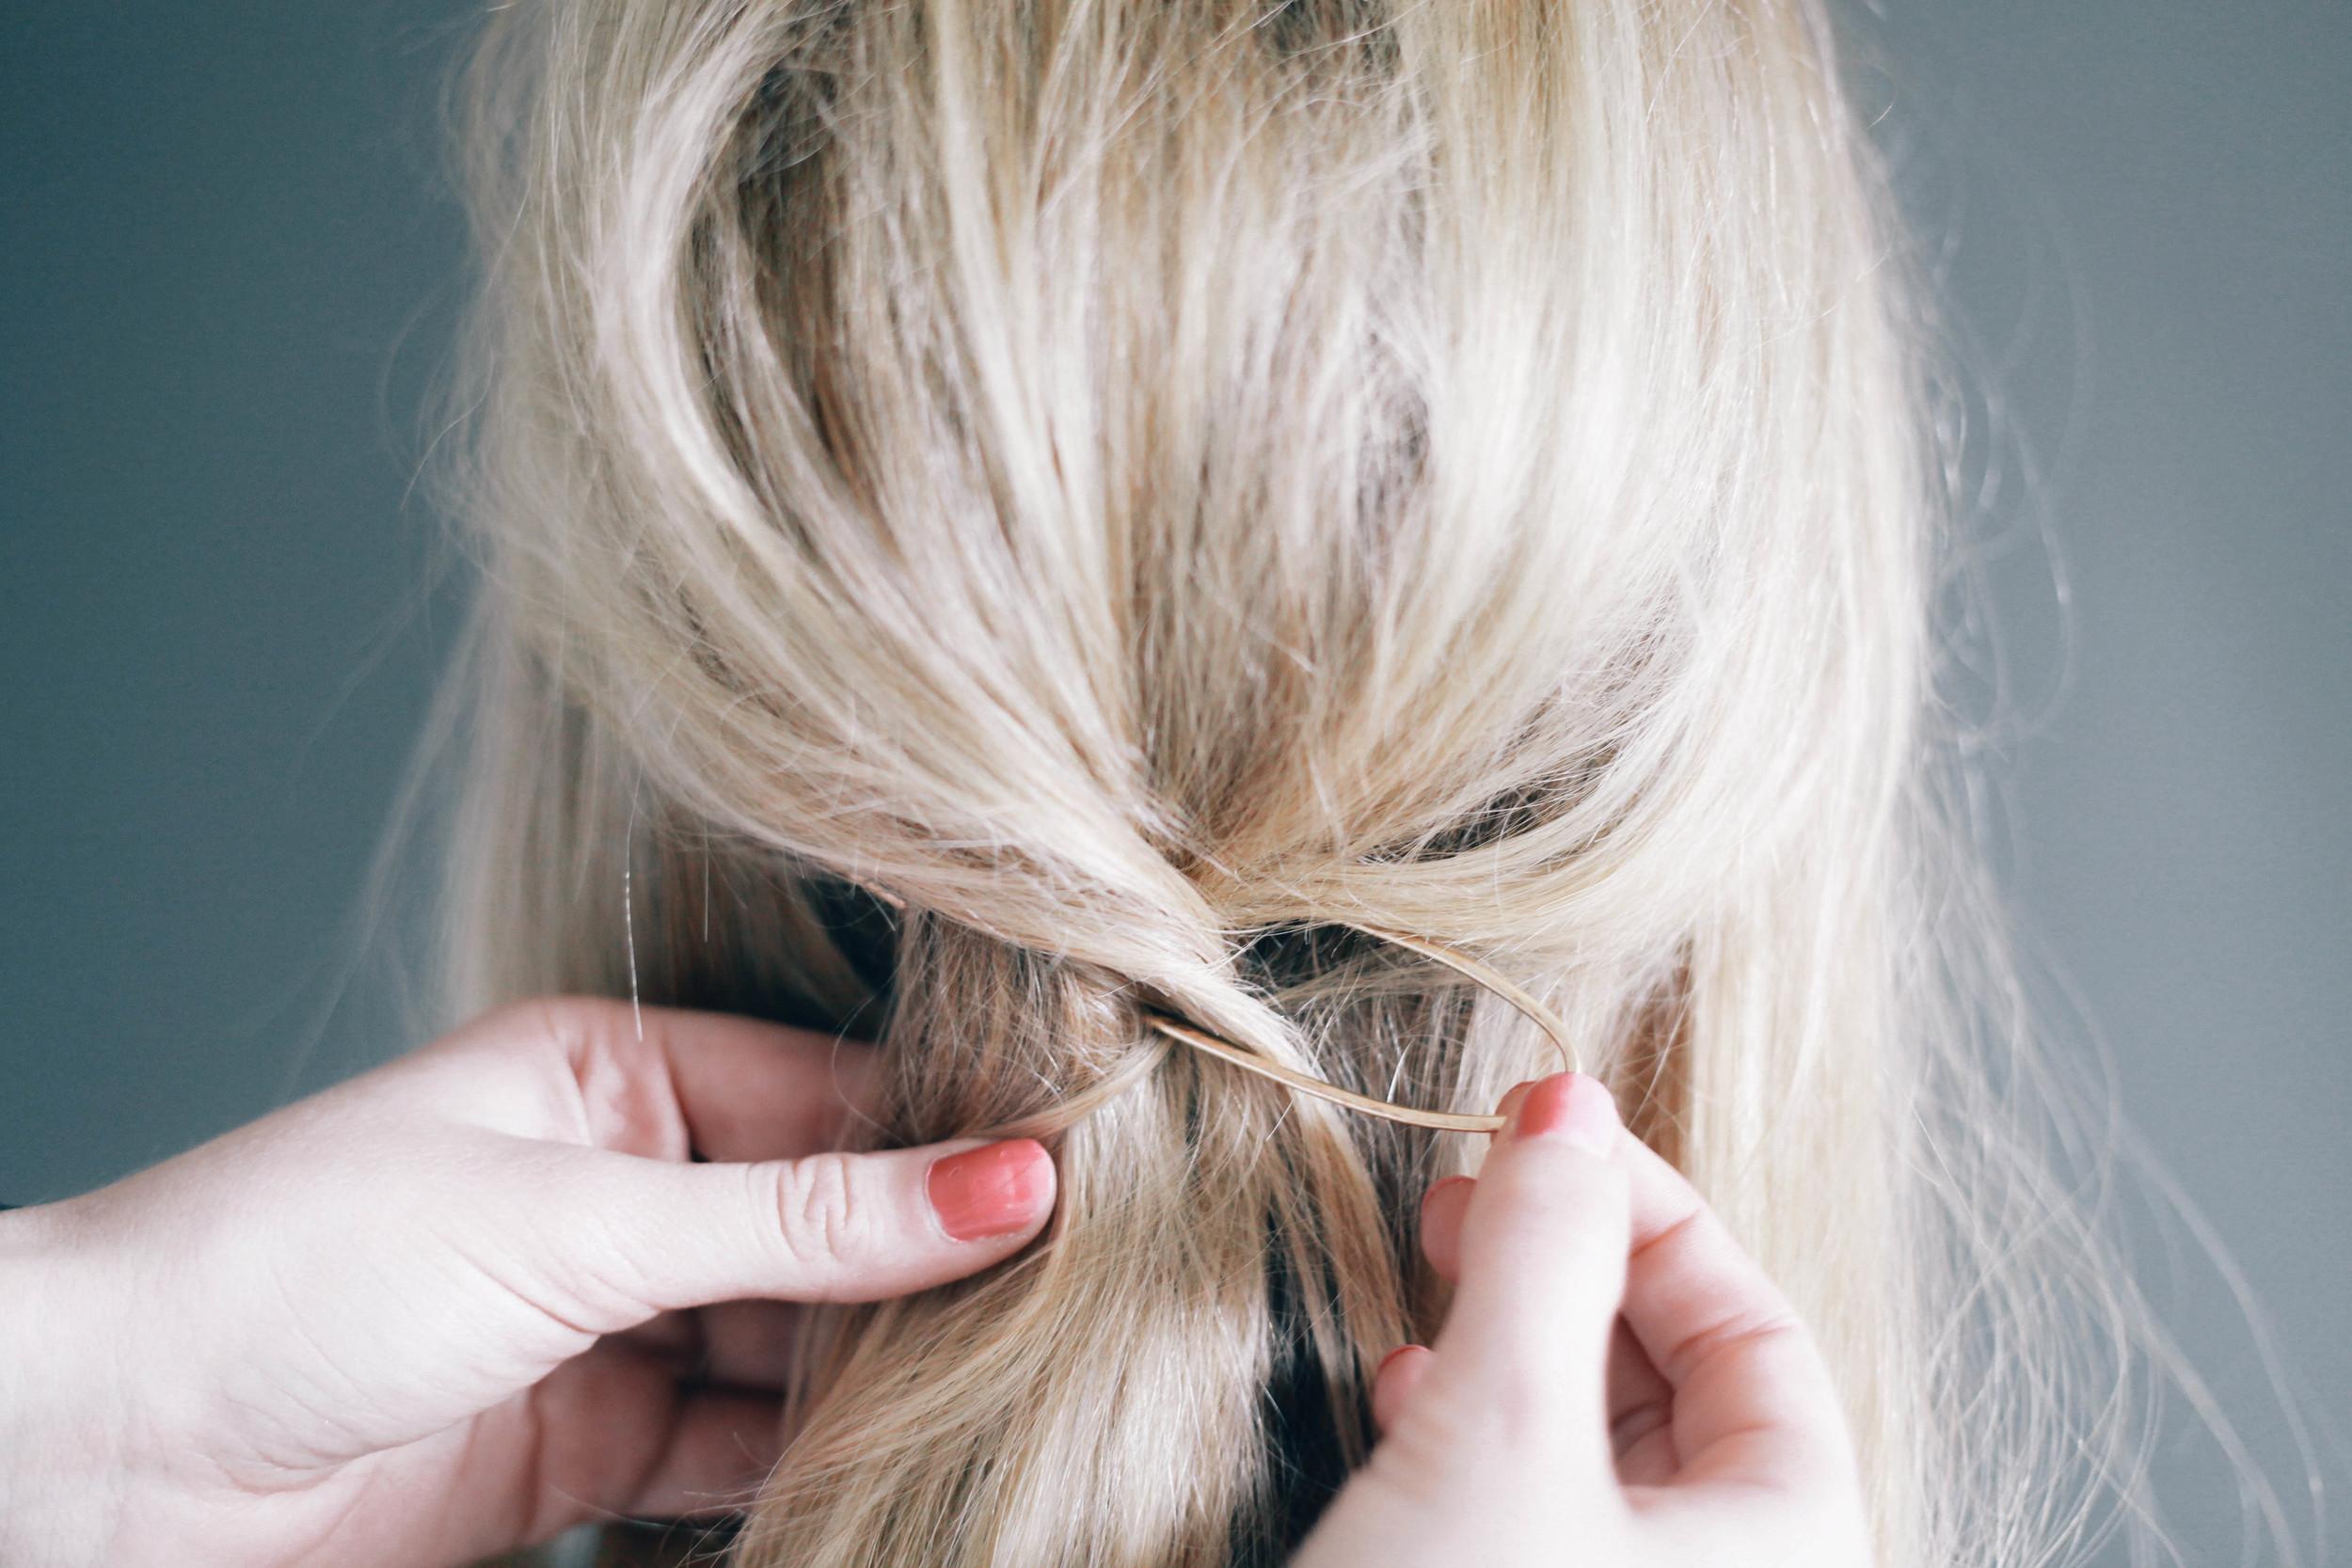 http://treasuresandtravelsblog.com/blog/2015/7/6/half-up-hair-tutorial-treasures-hair-pin